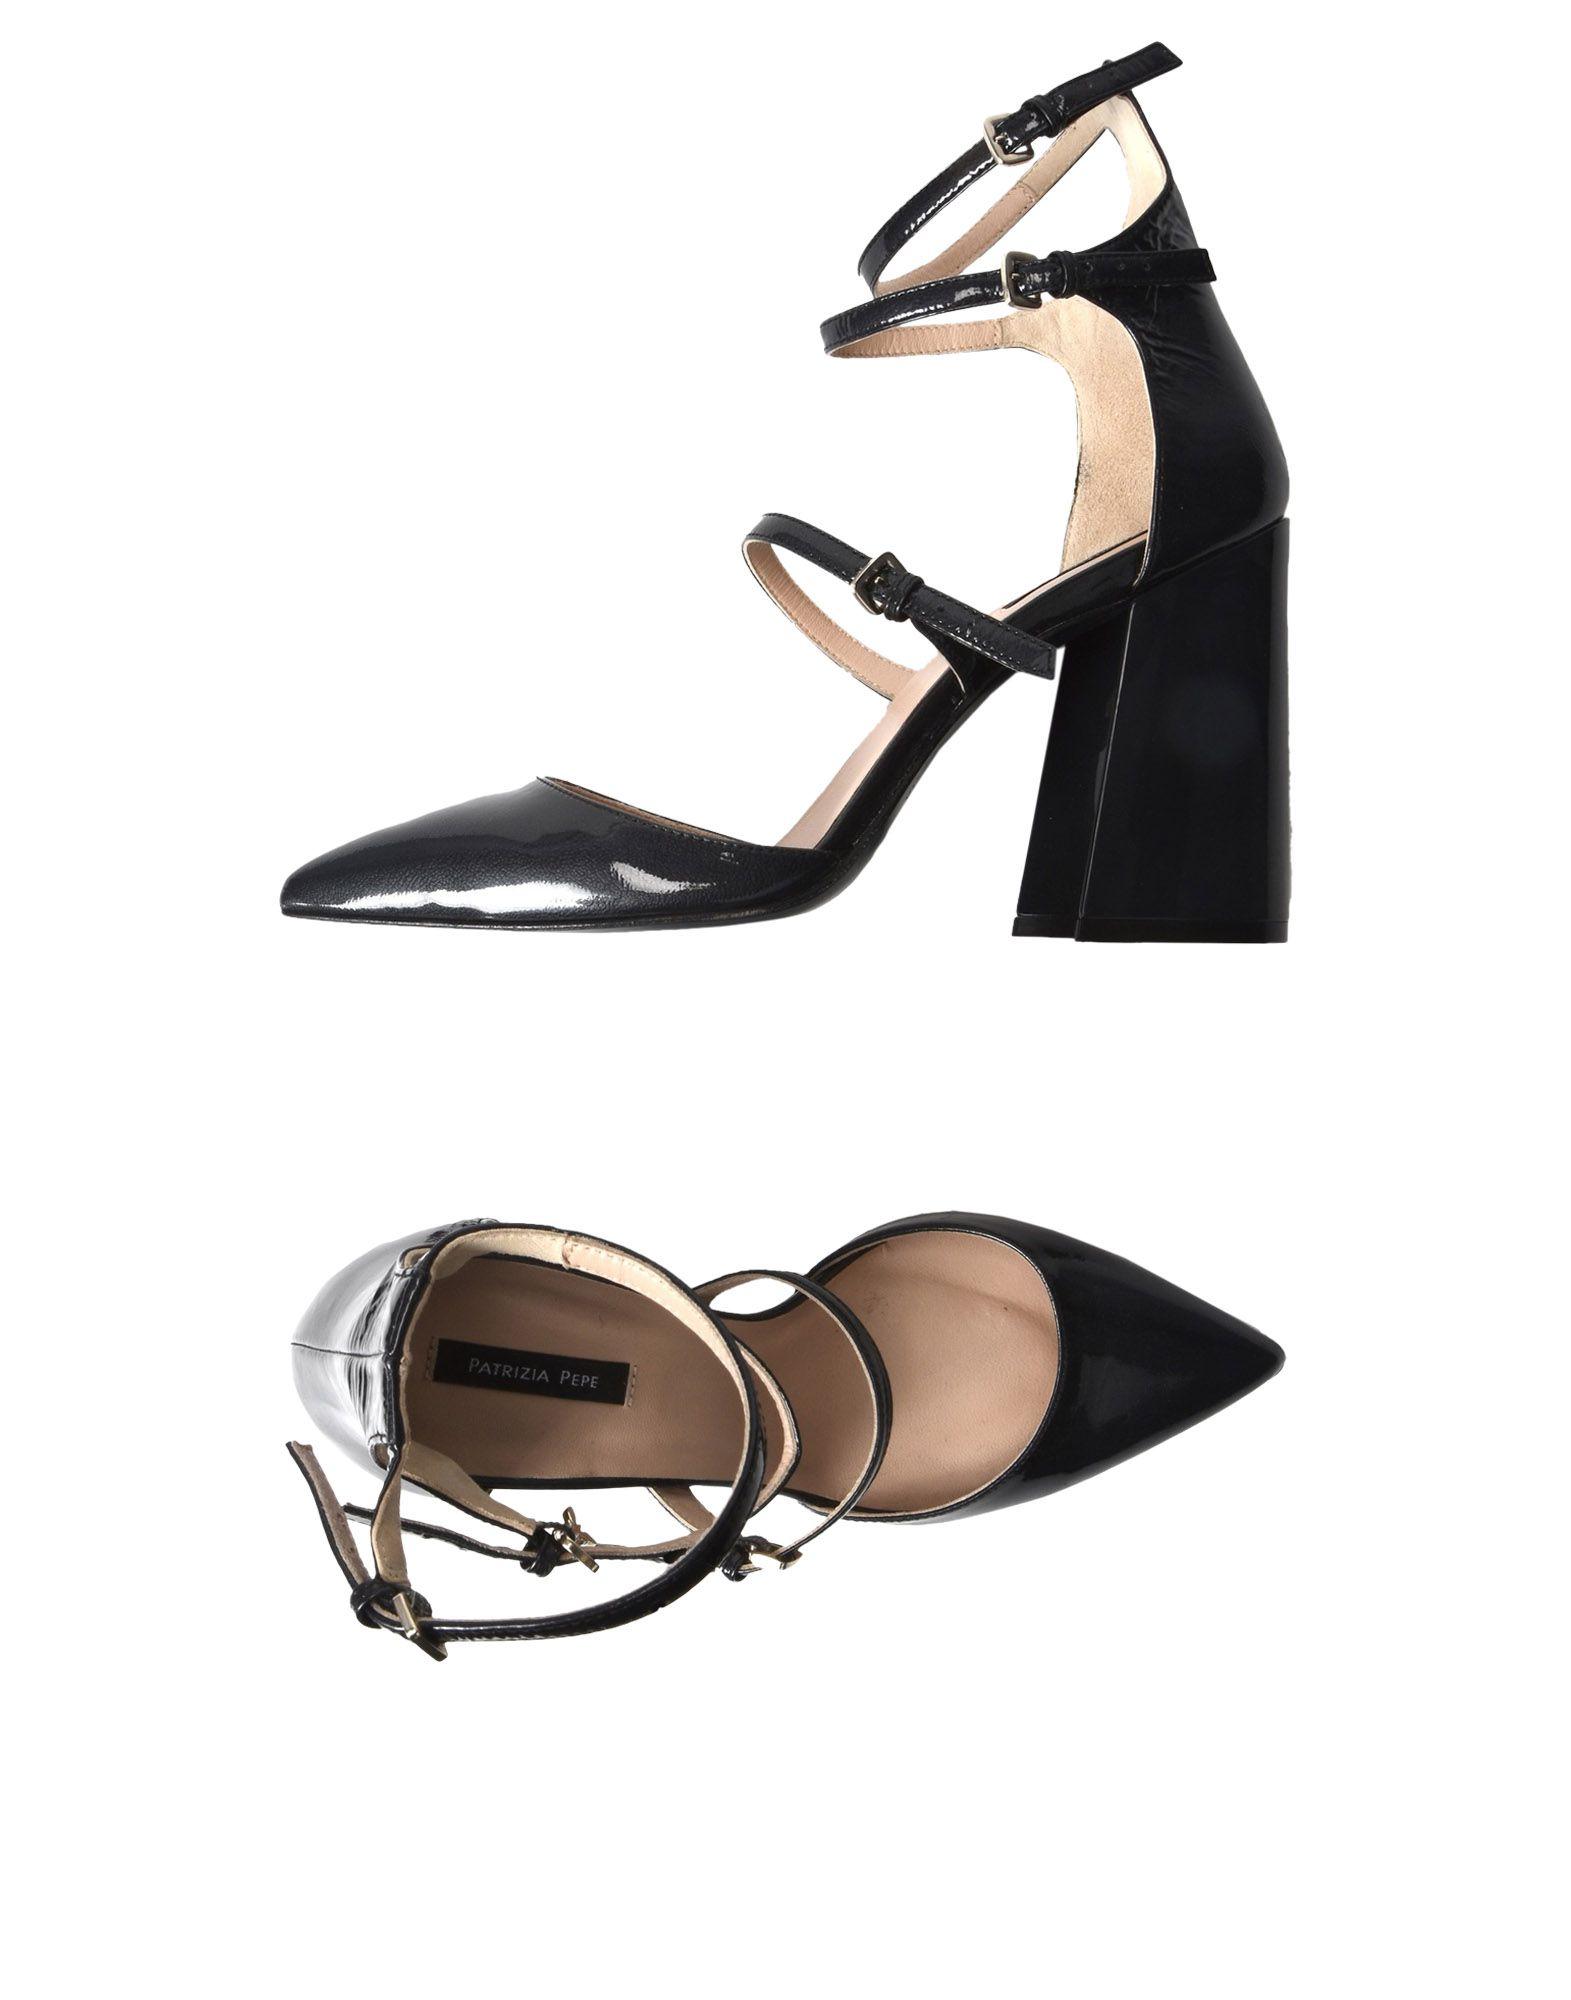 Patrizia Pepe Gute Pumps Damen  11475612CQ Gute Pepe Qualität beliebte Schuhe 45802a